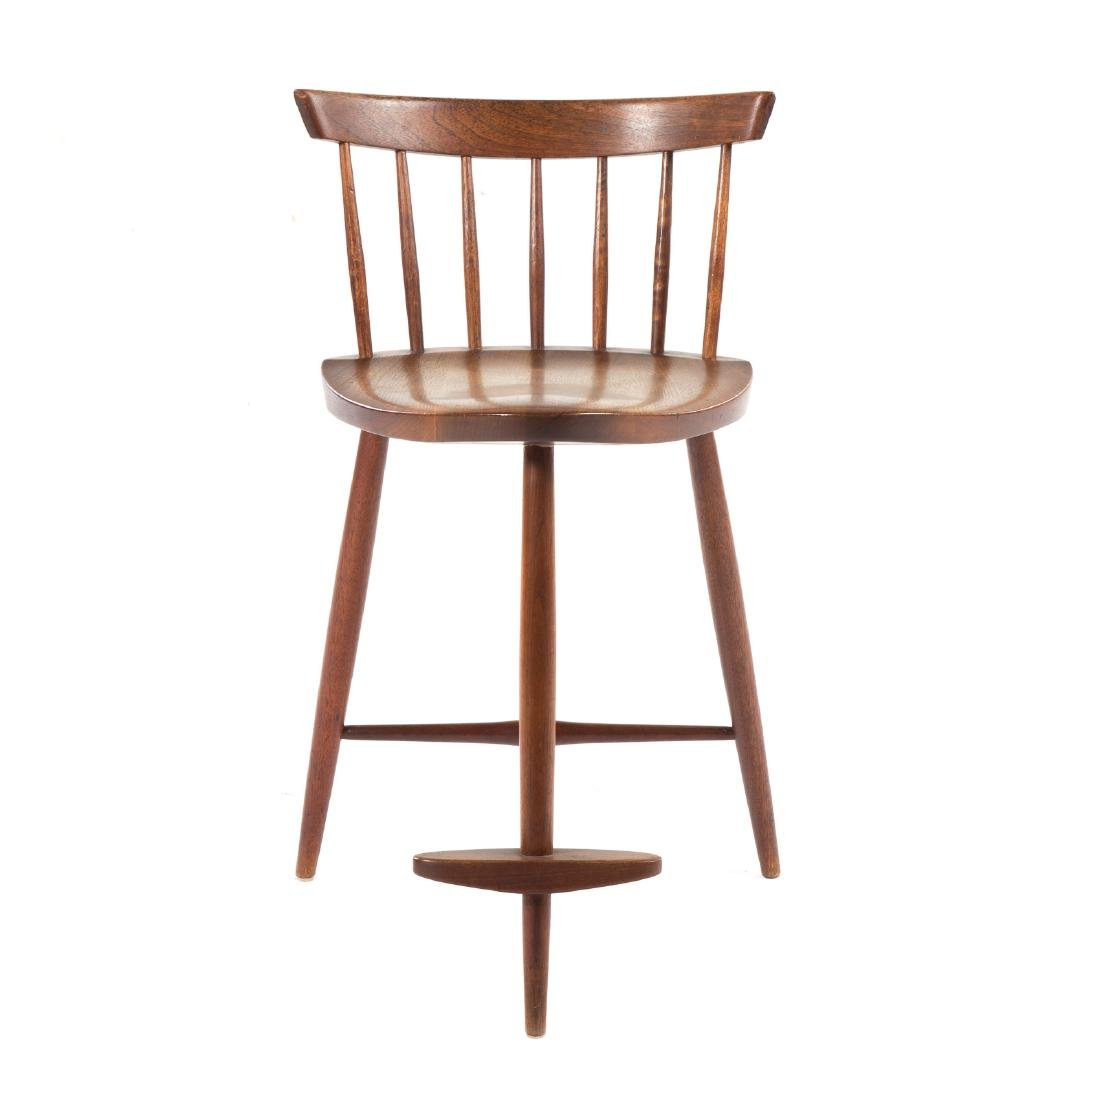 George Nakashima High Mira Chair